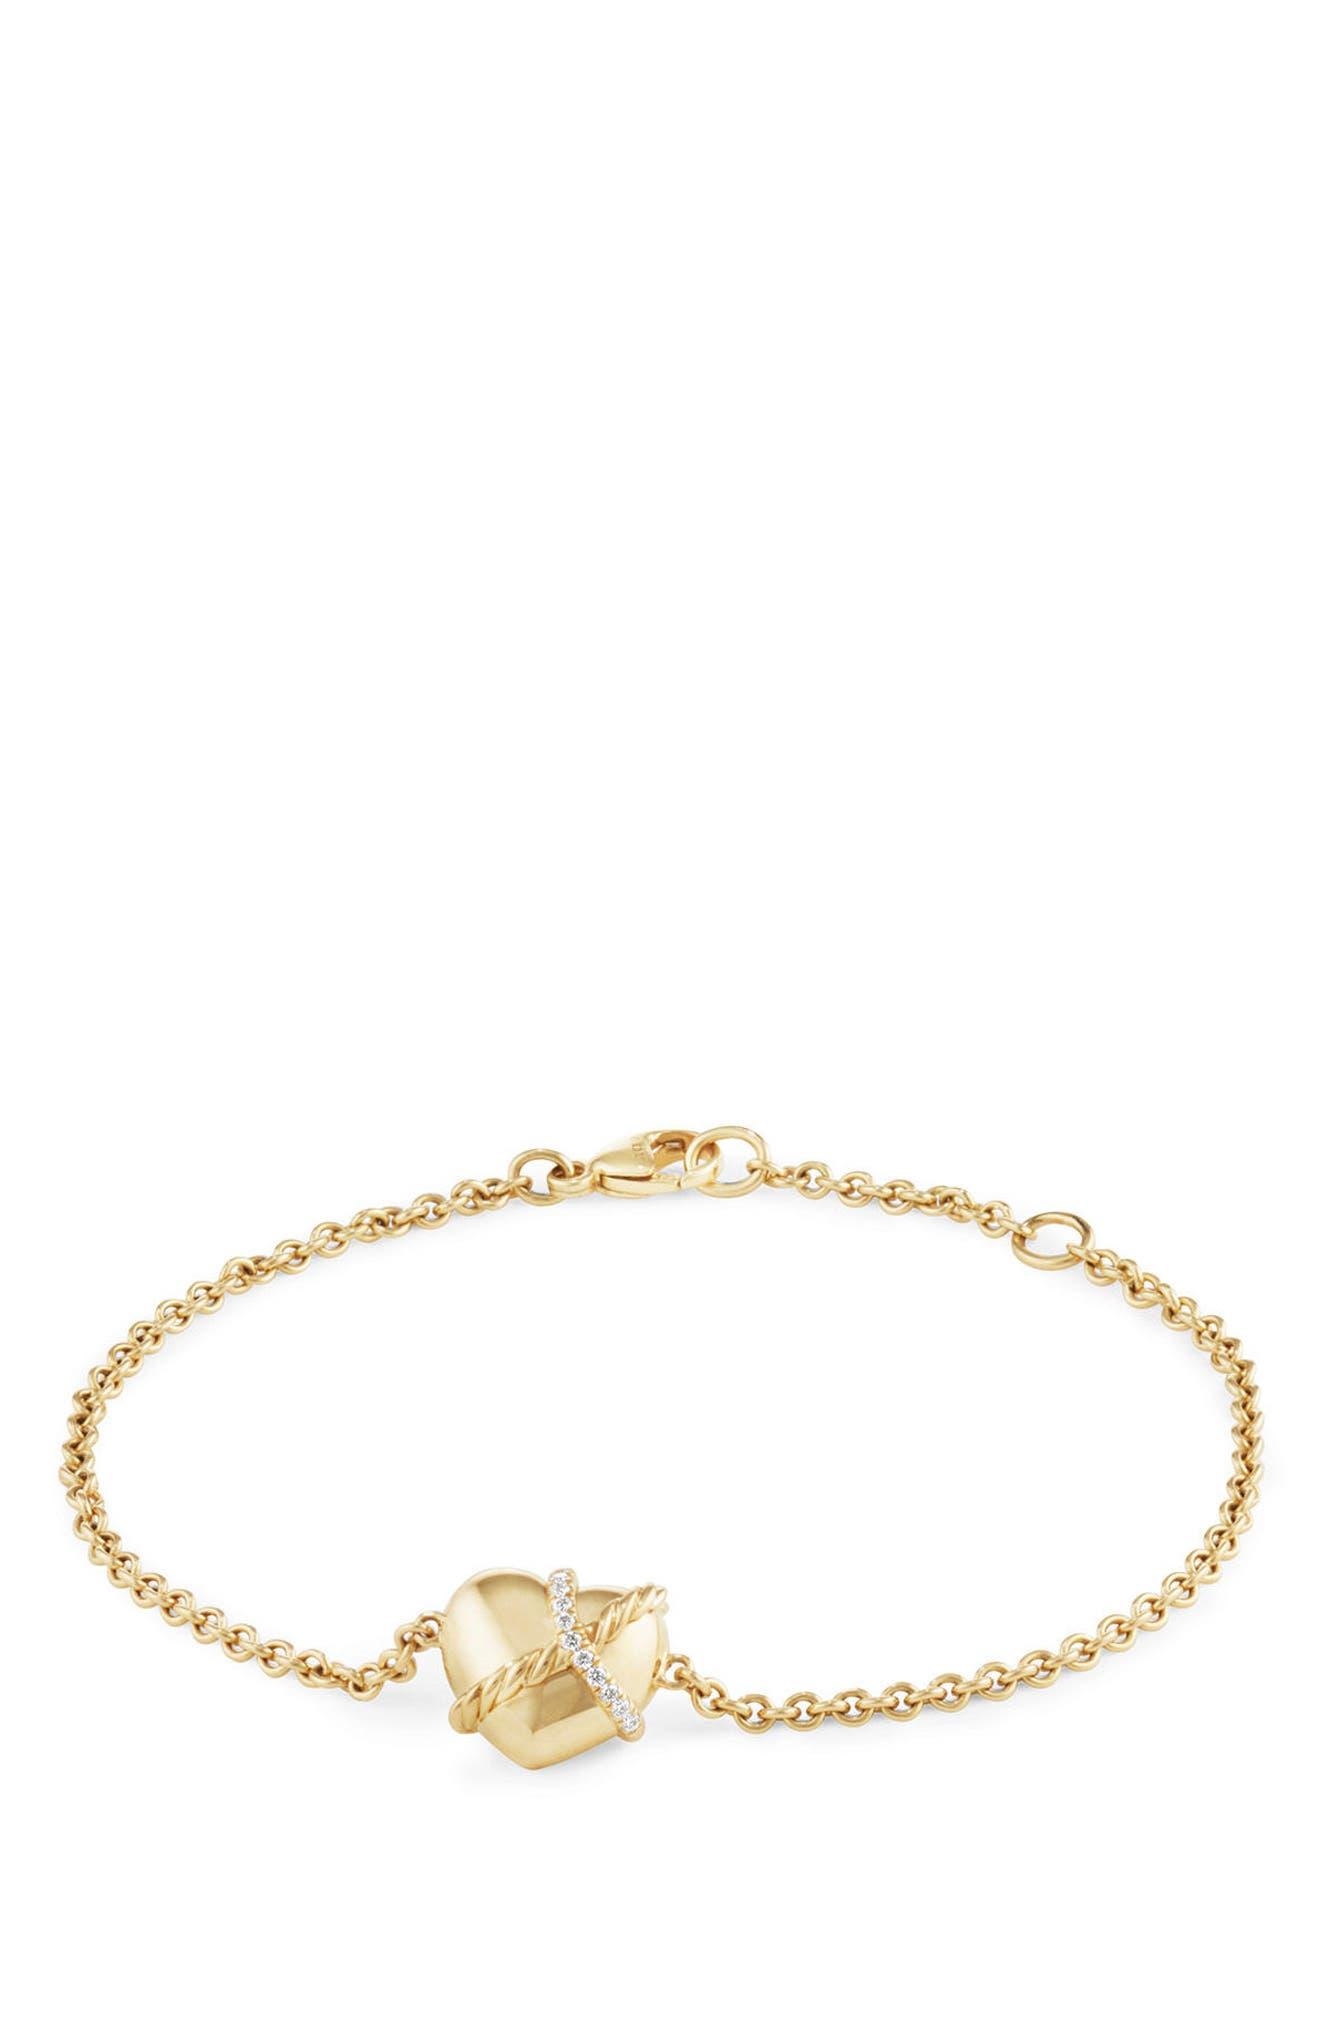 DAVID YURMAN Heart Bracelet in 18K Gold with Diamonds